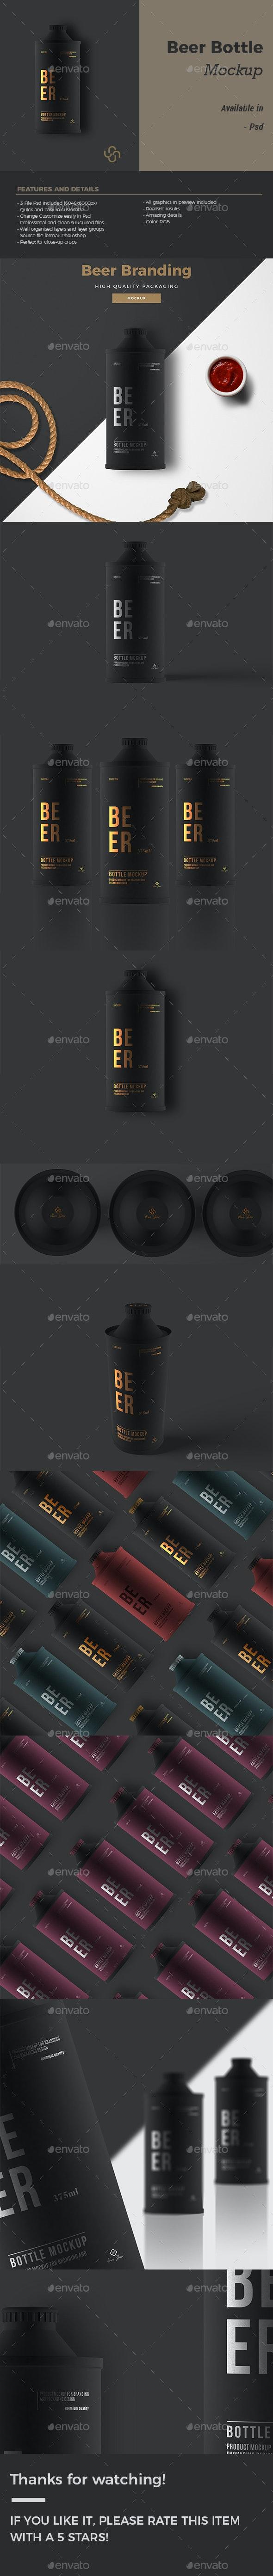 Beer Bottle Mockup - Product Mock-Ups Graphics